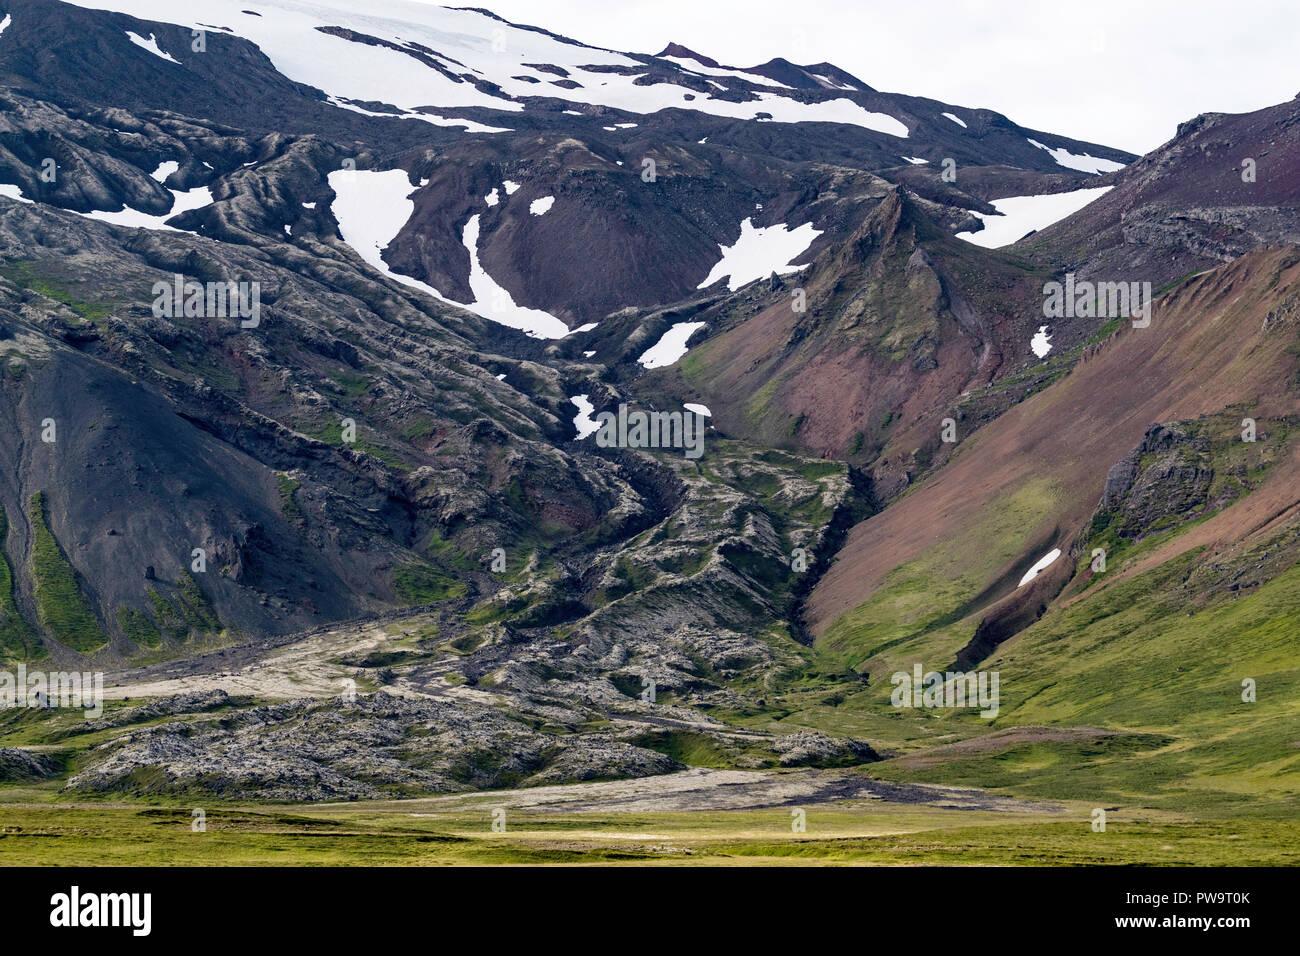 A view of the stratovolcano Snæfellsjökull, Snæfellsnes National Park, Iceland - Stock Image